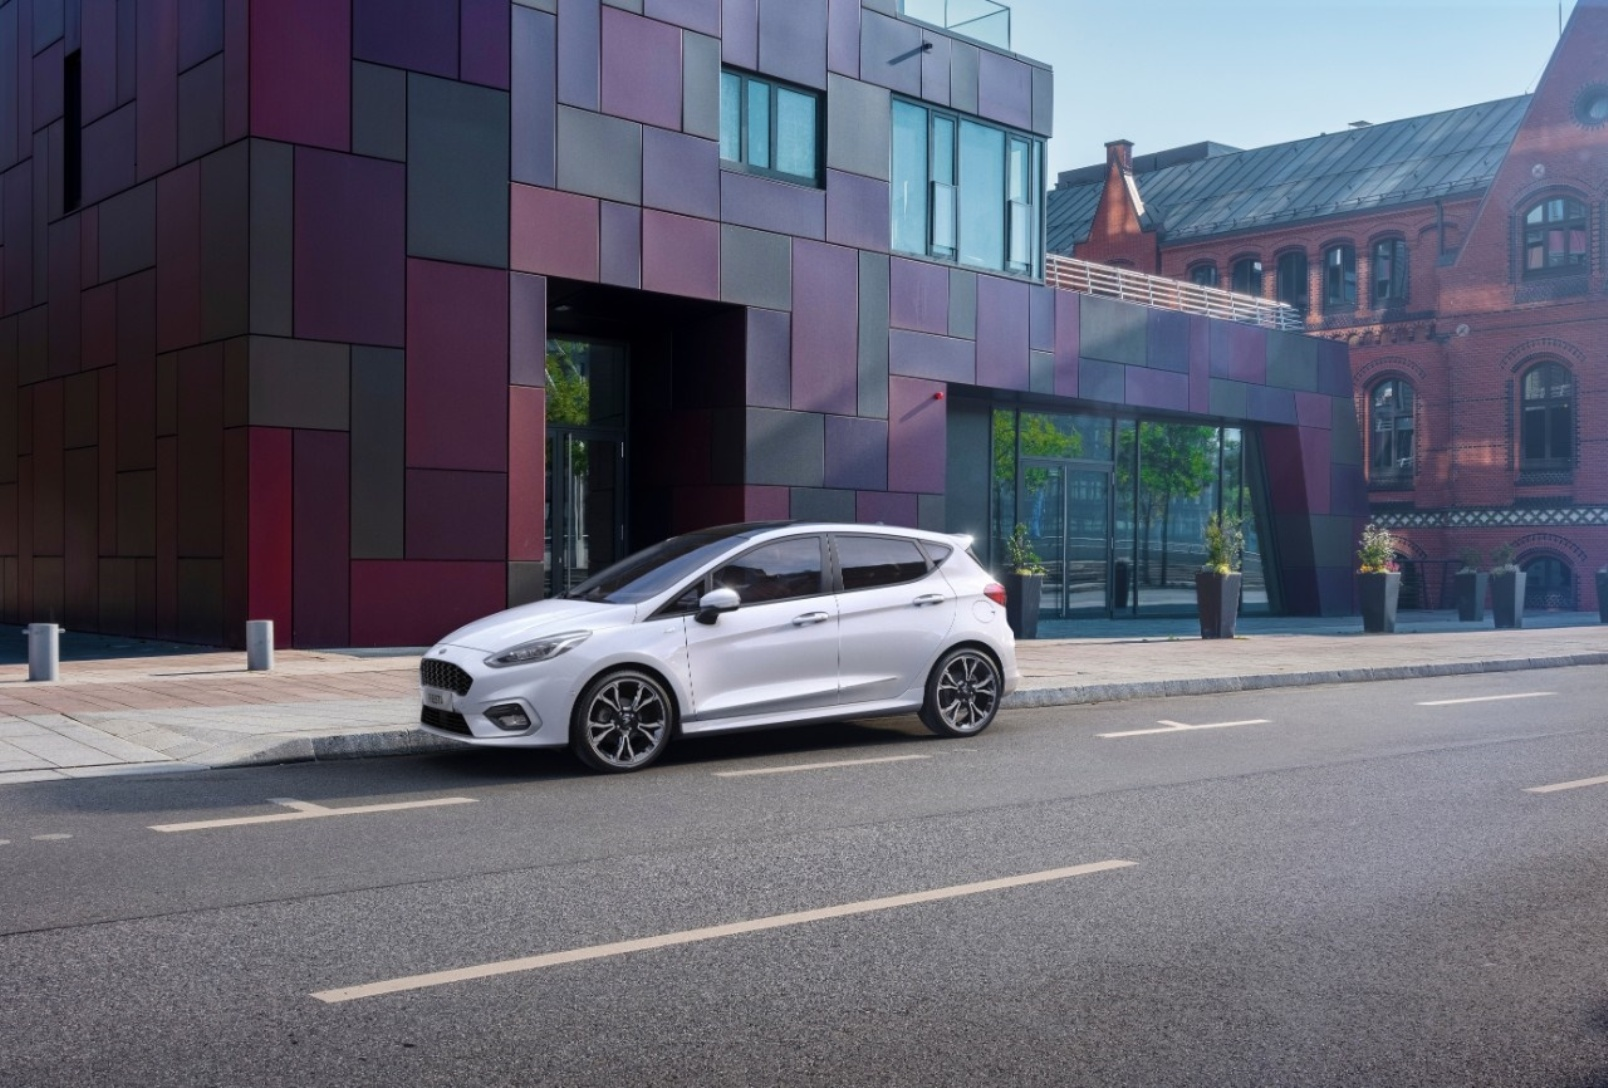 Ford Fiesta Mhev 2020 (2)